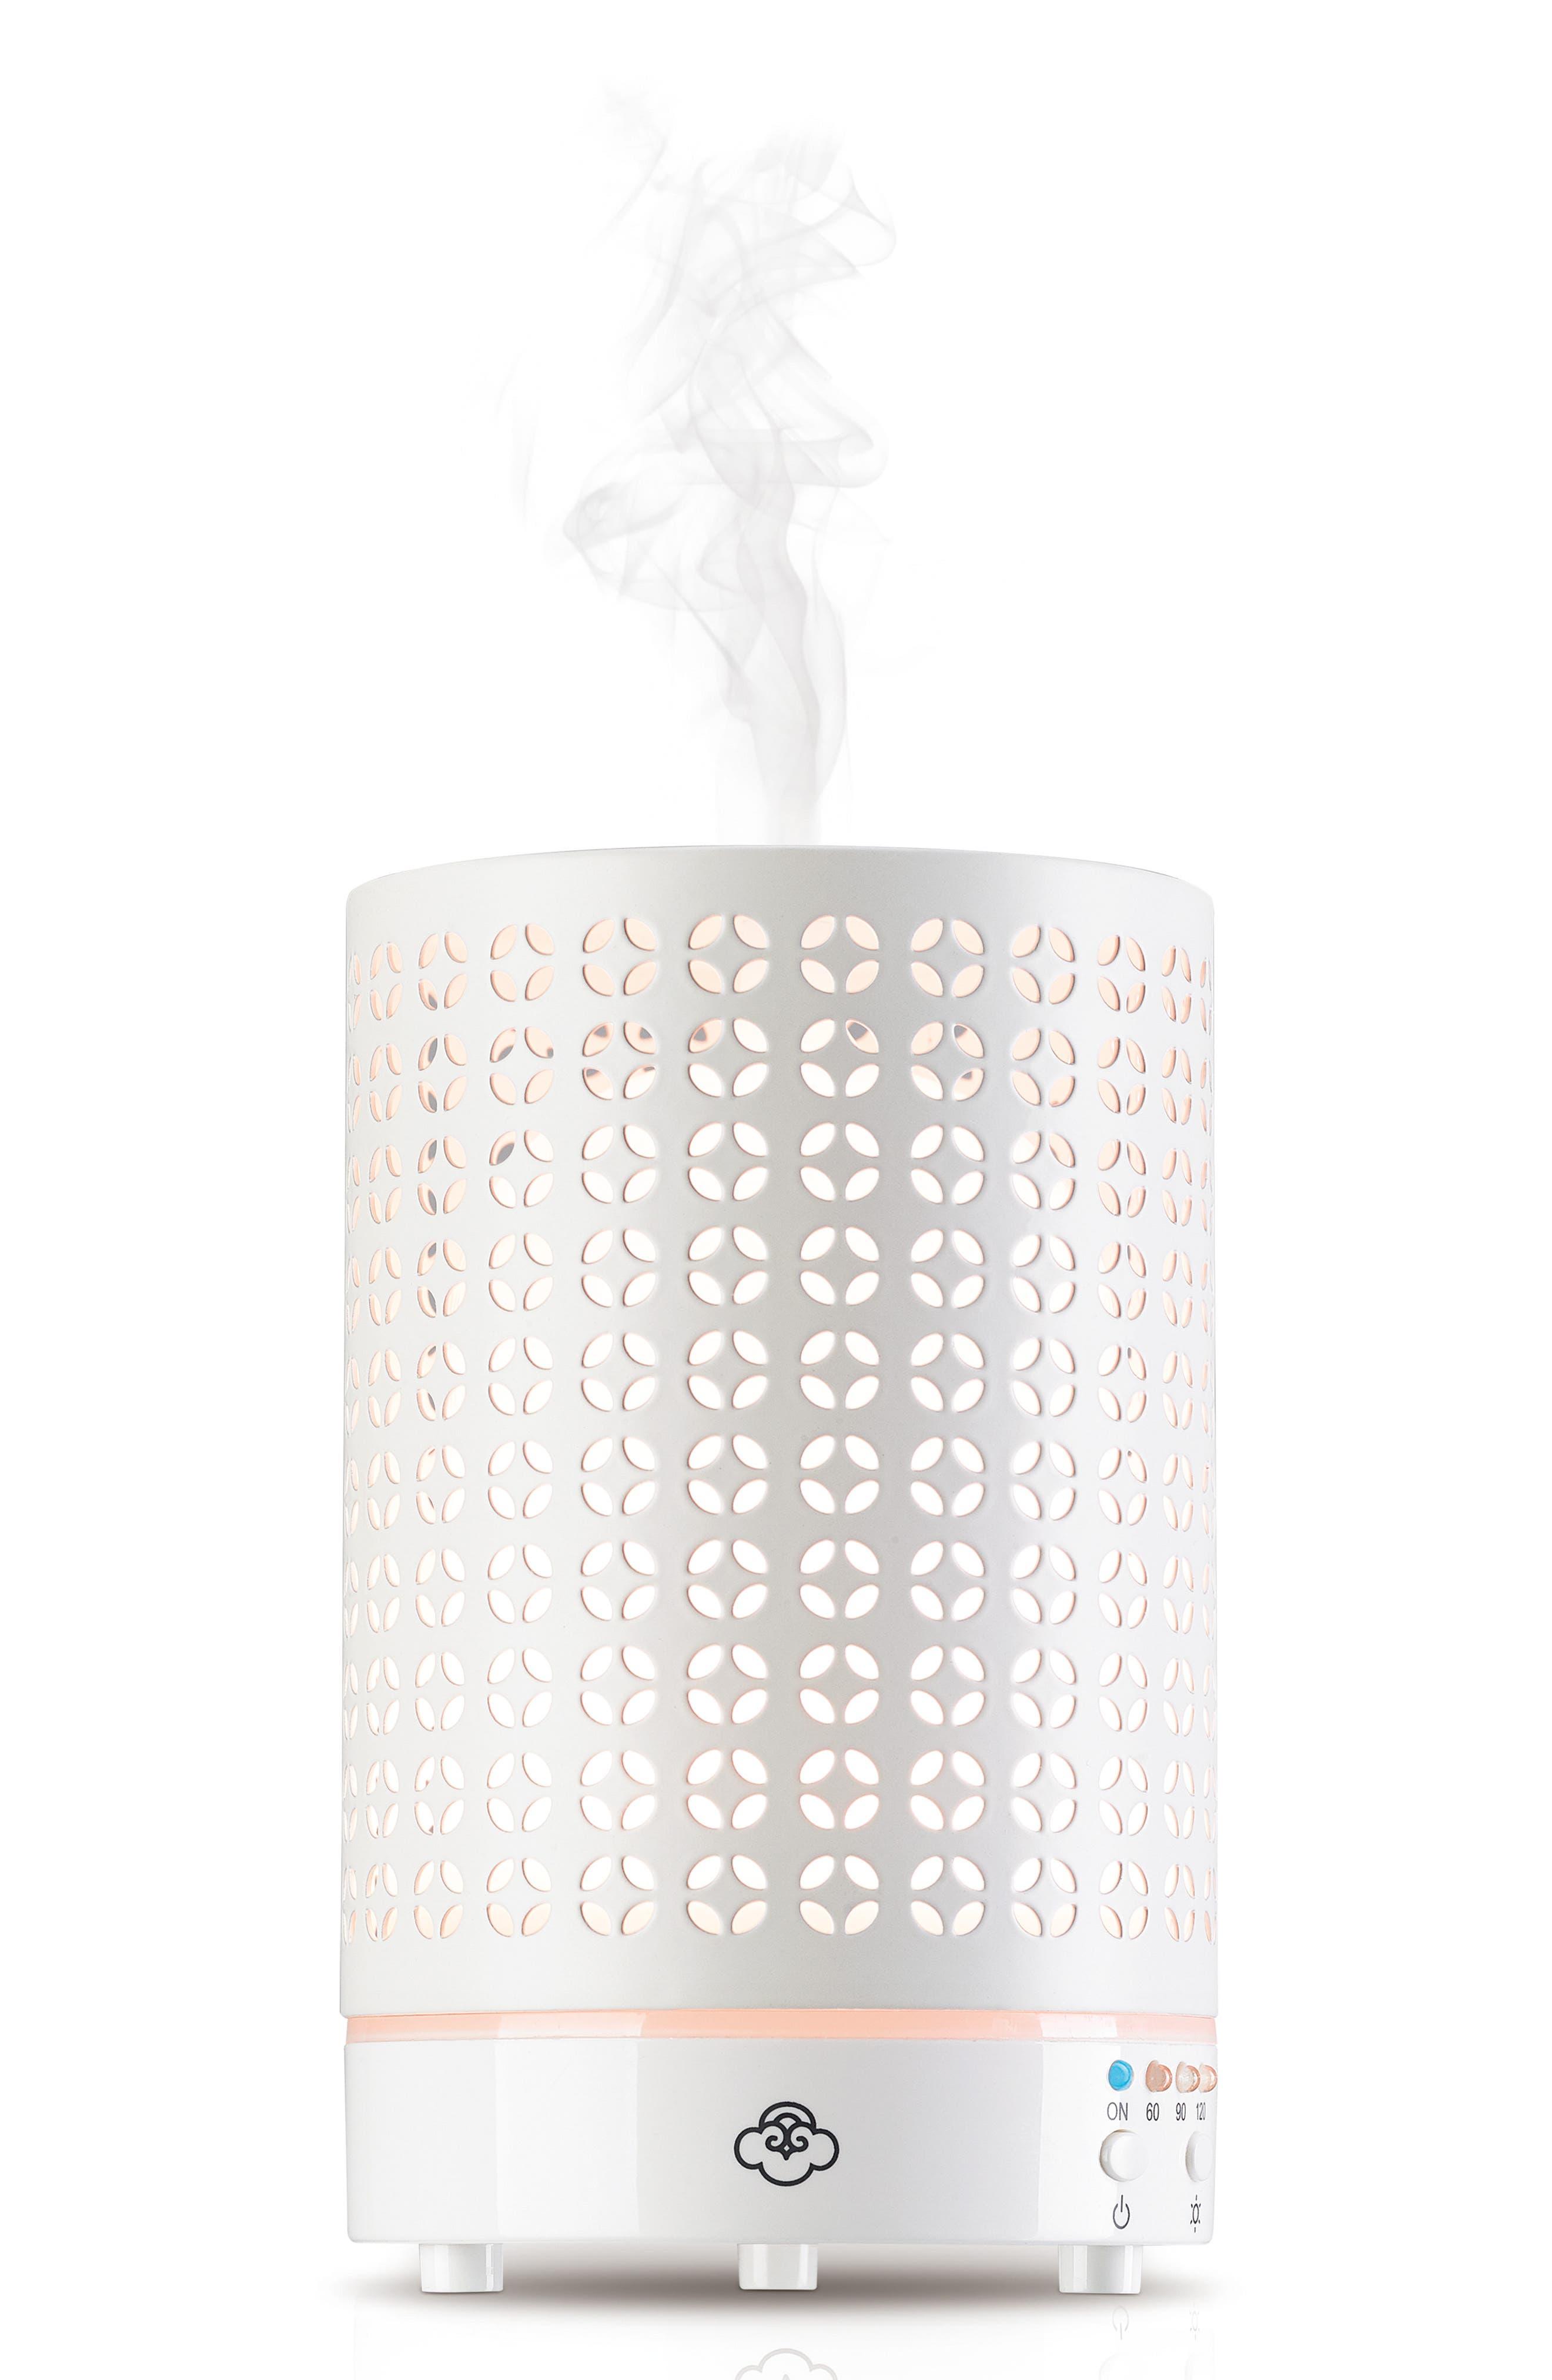 SERENE HOUSE Cool Mist Cosmos Scentilizer Ultrasonic Aroma Diffuser, Main, color, WHITE